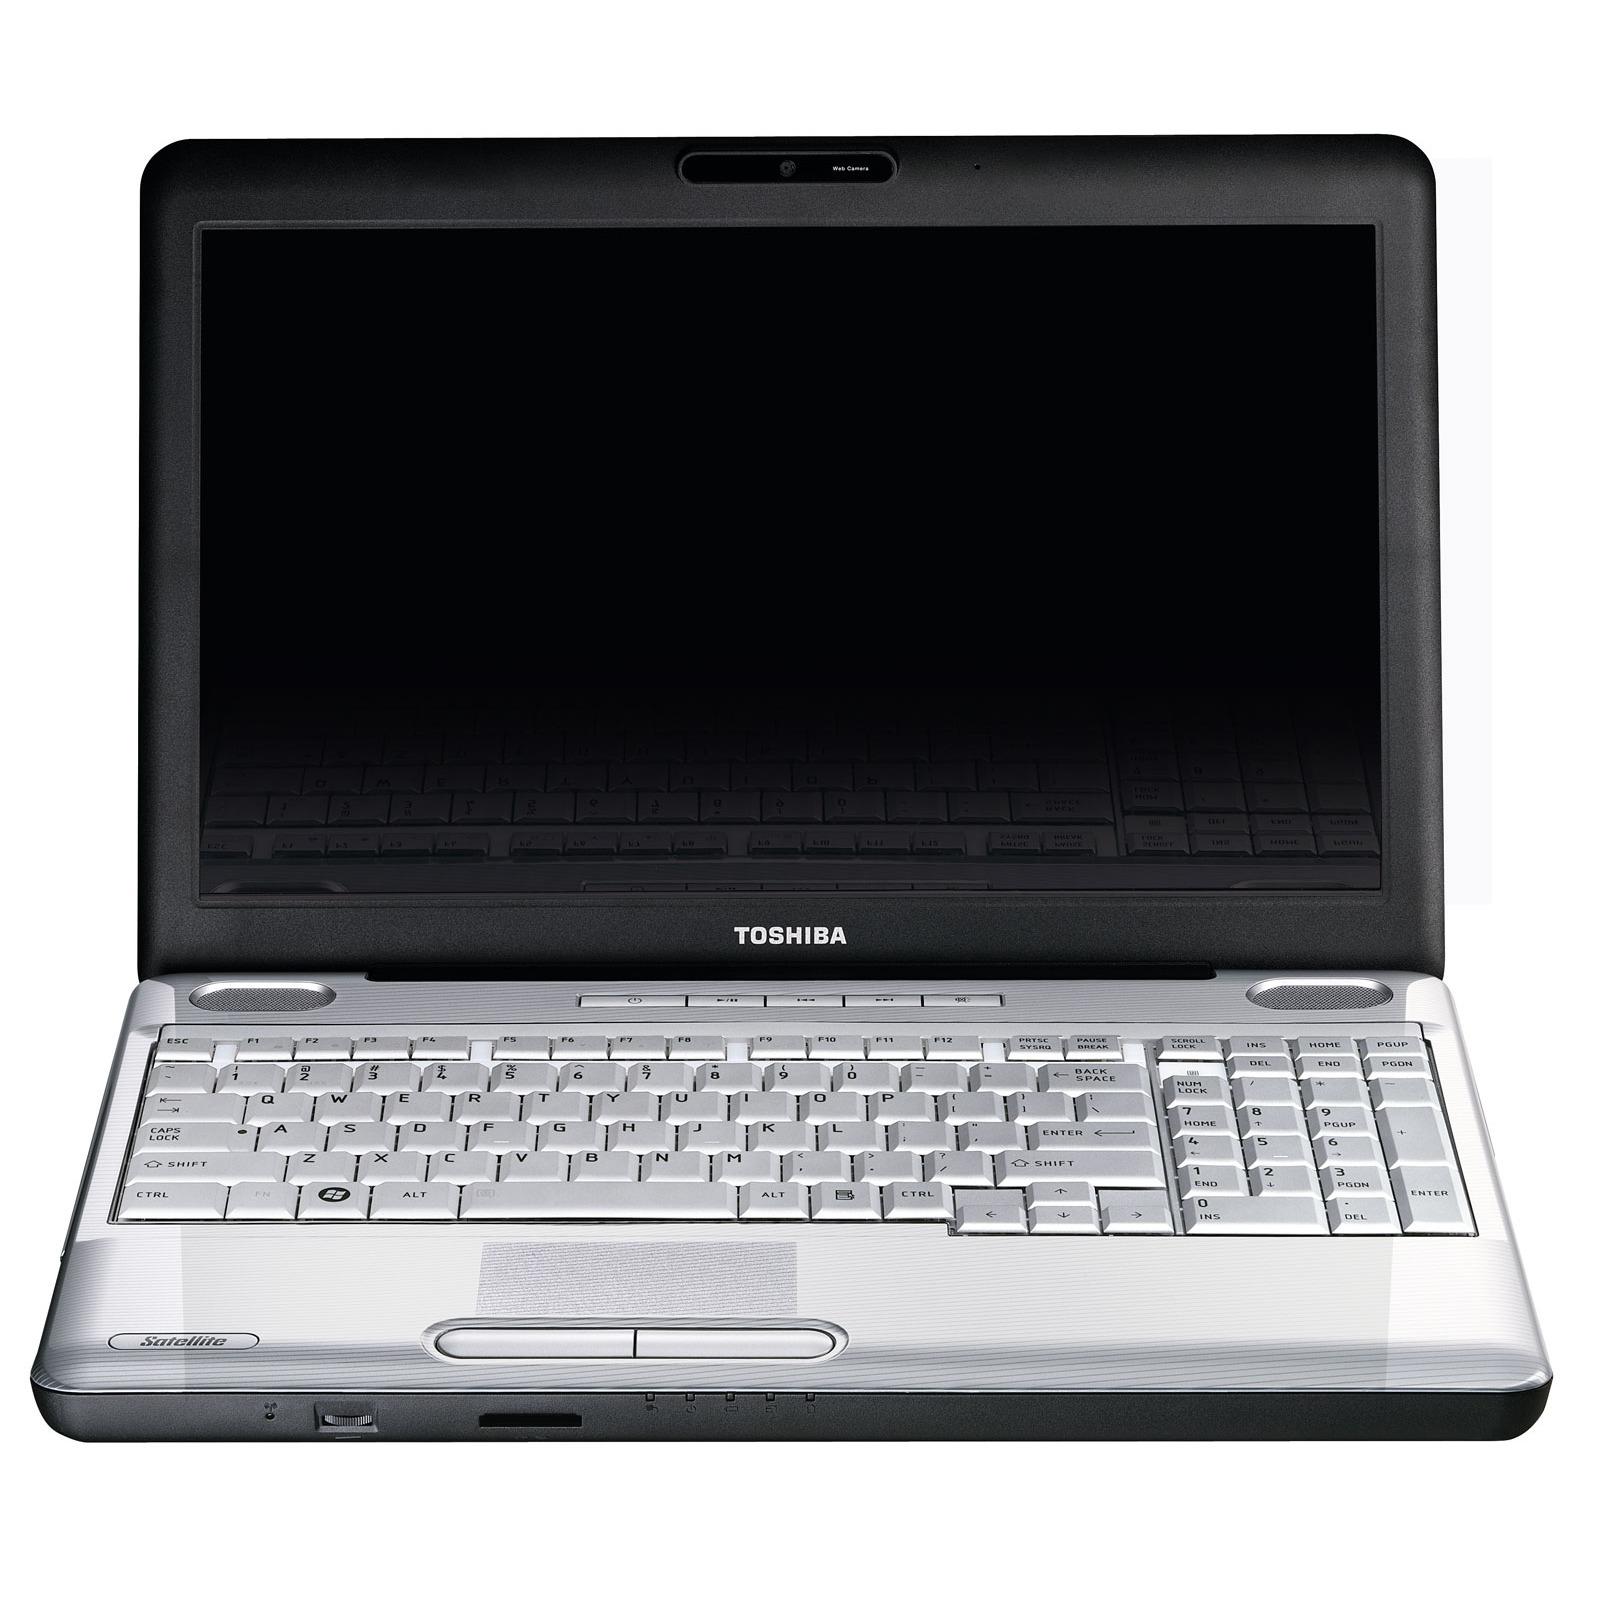 "PC portable Toshiba Satellite L500-13Z Toshiba Satellite L500-13Z - Intel Pentium Dual-Core T4200 4 Go 500 Go 15.6"" TFT Graveur DVD Super Multi DL Wi-Fi N Webcam WVFB"